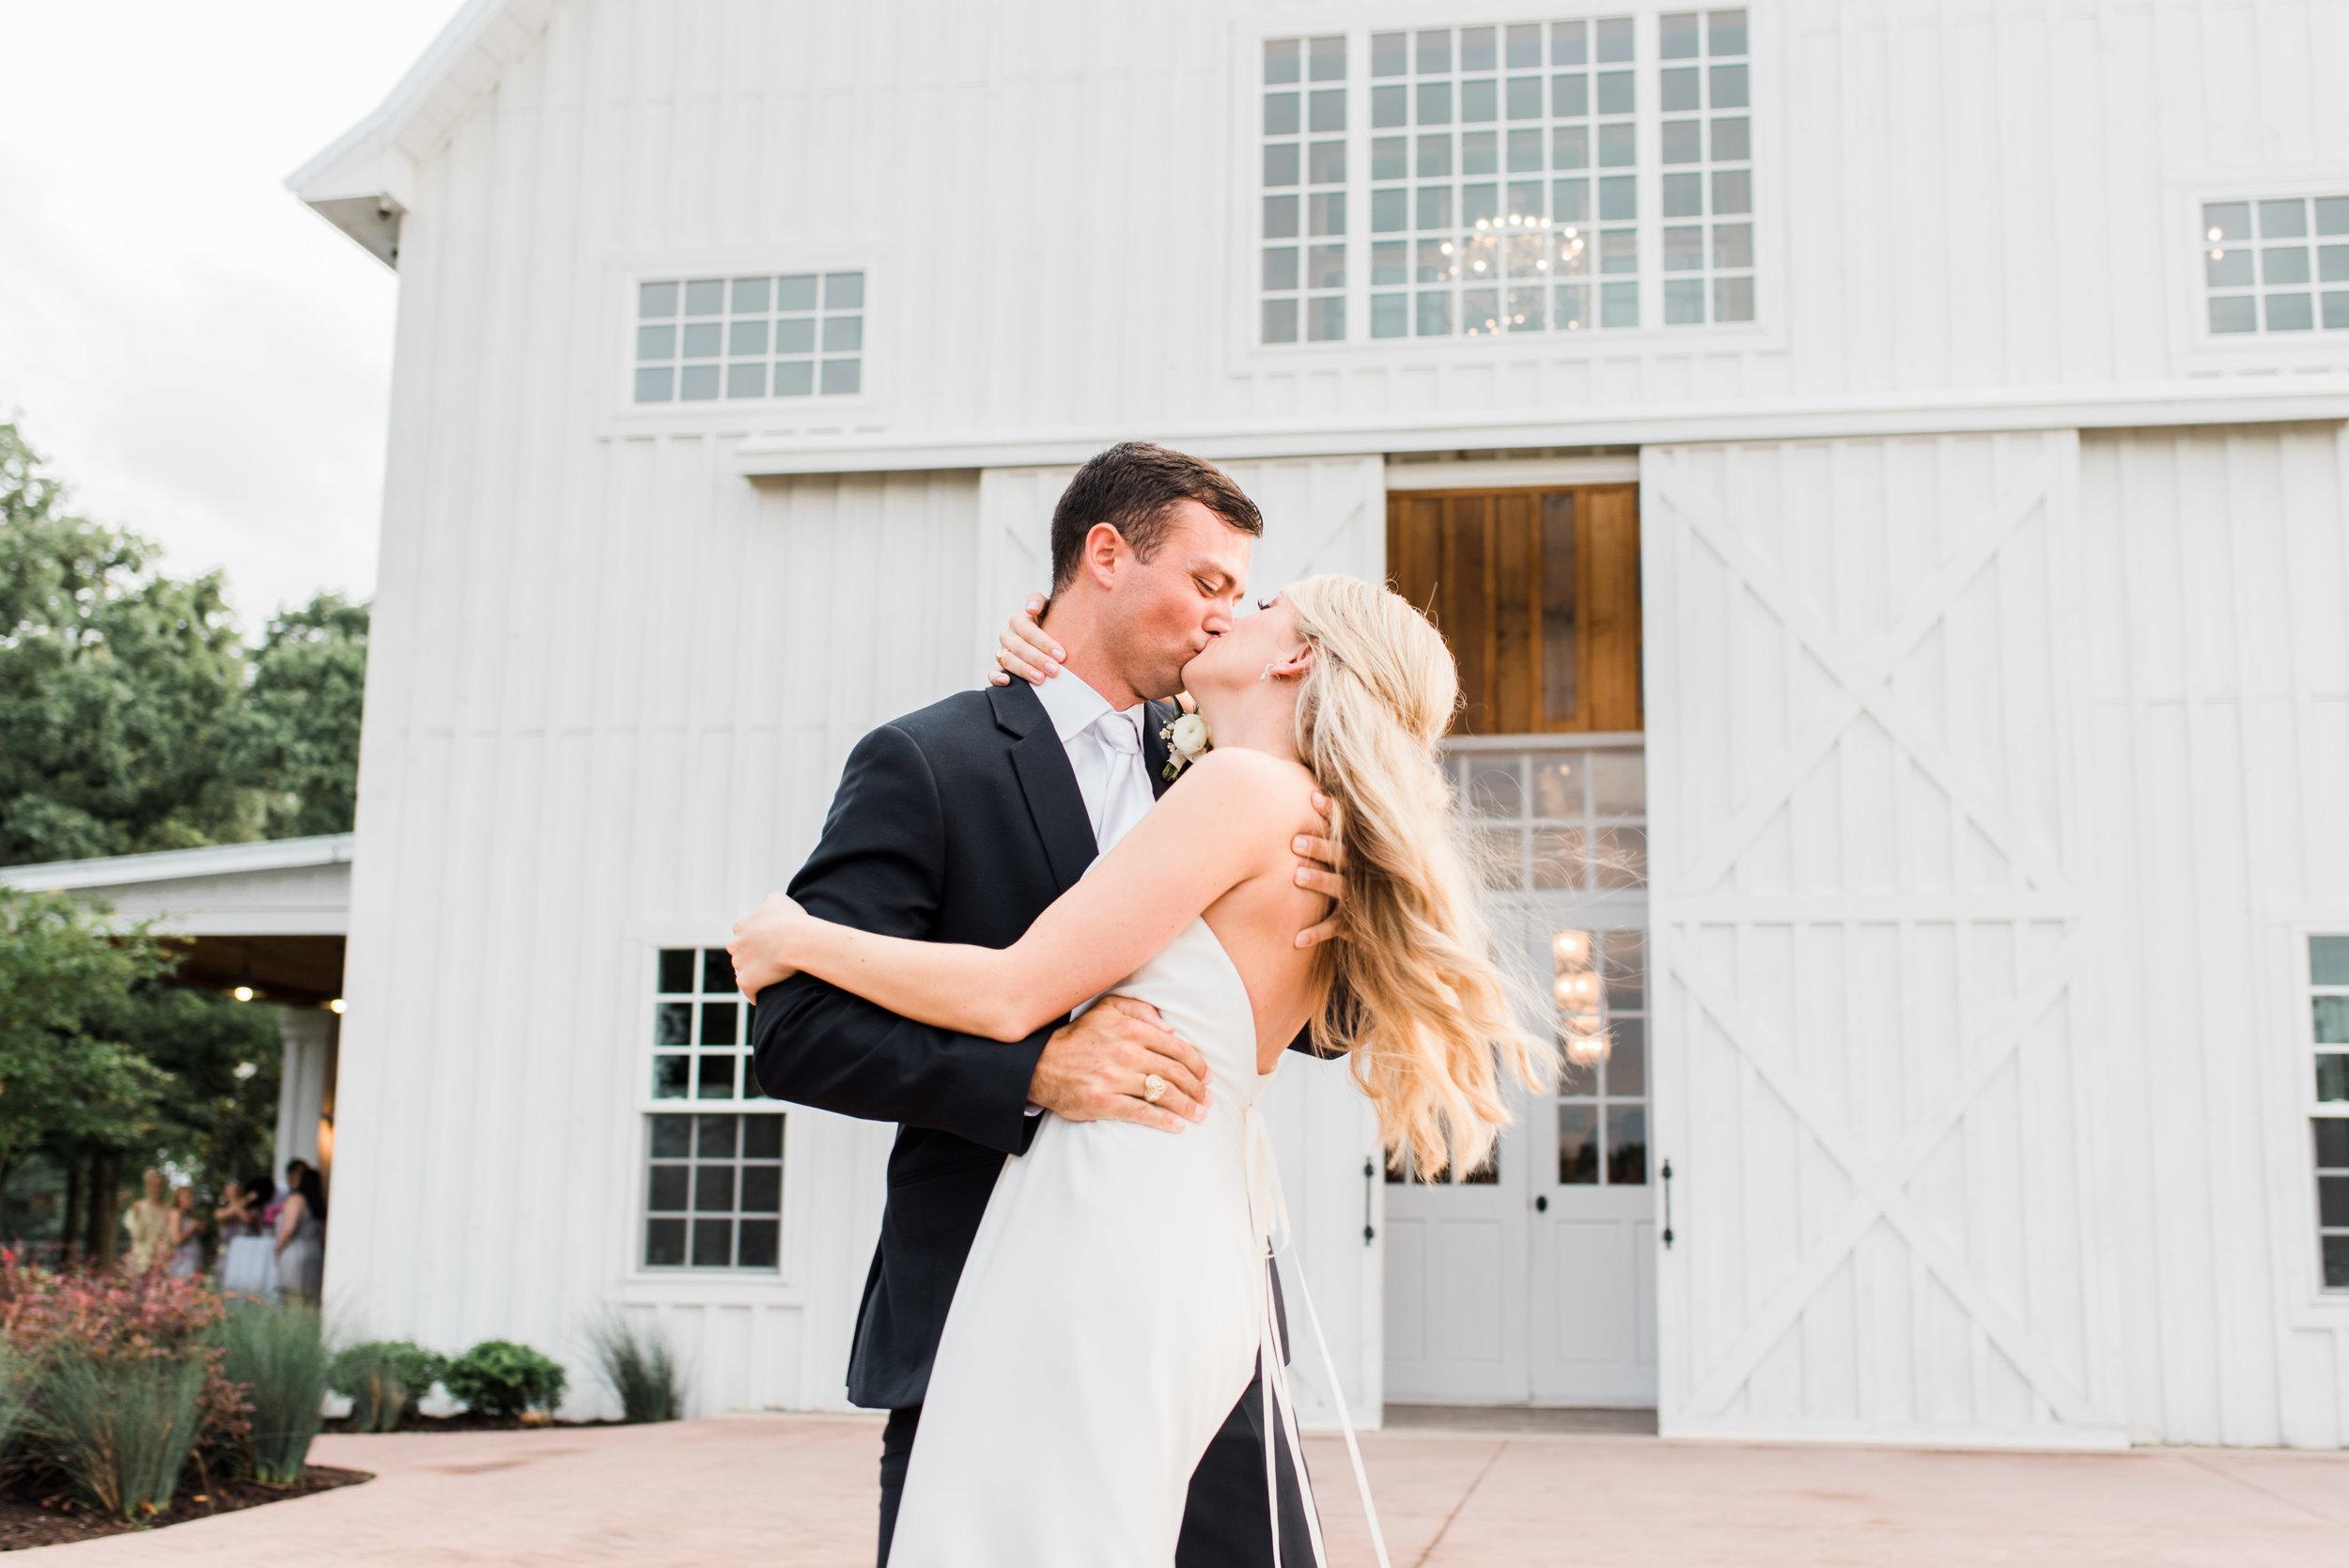 gray-door-photography-wedding-portraits-dallas-photographer-steph-erffmeyer11.jpg